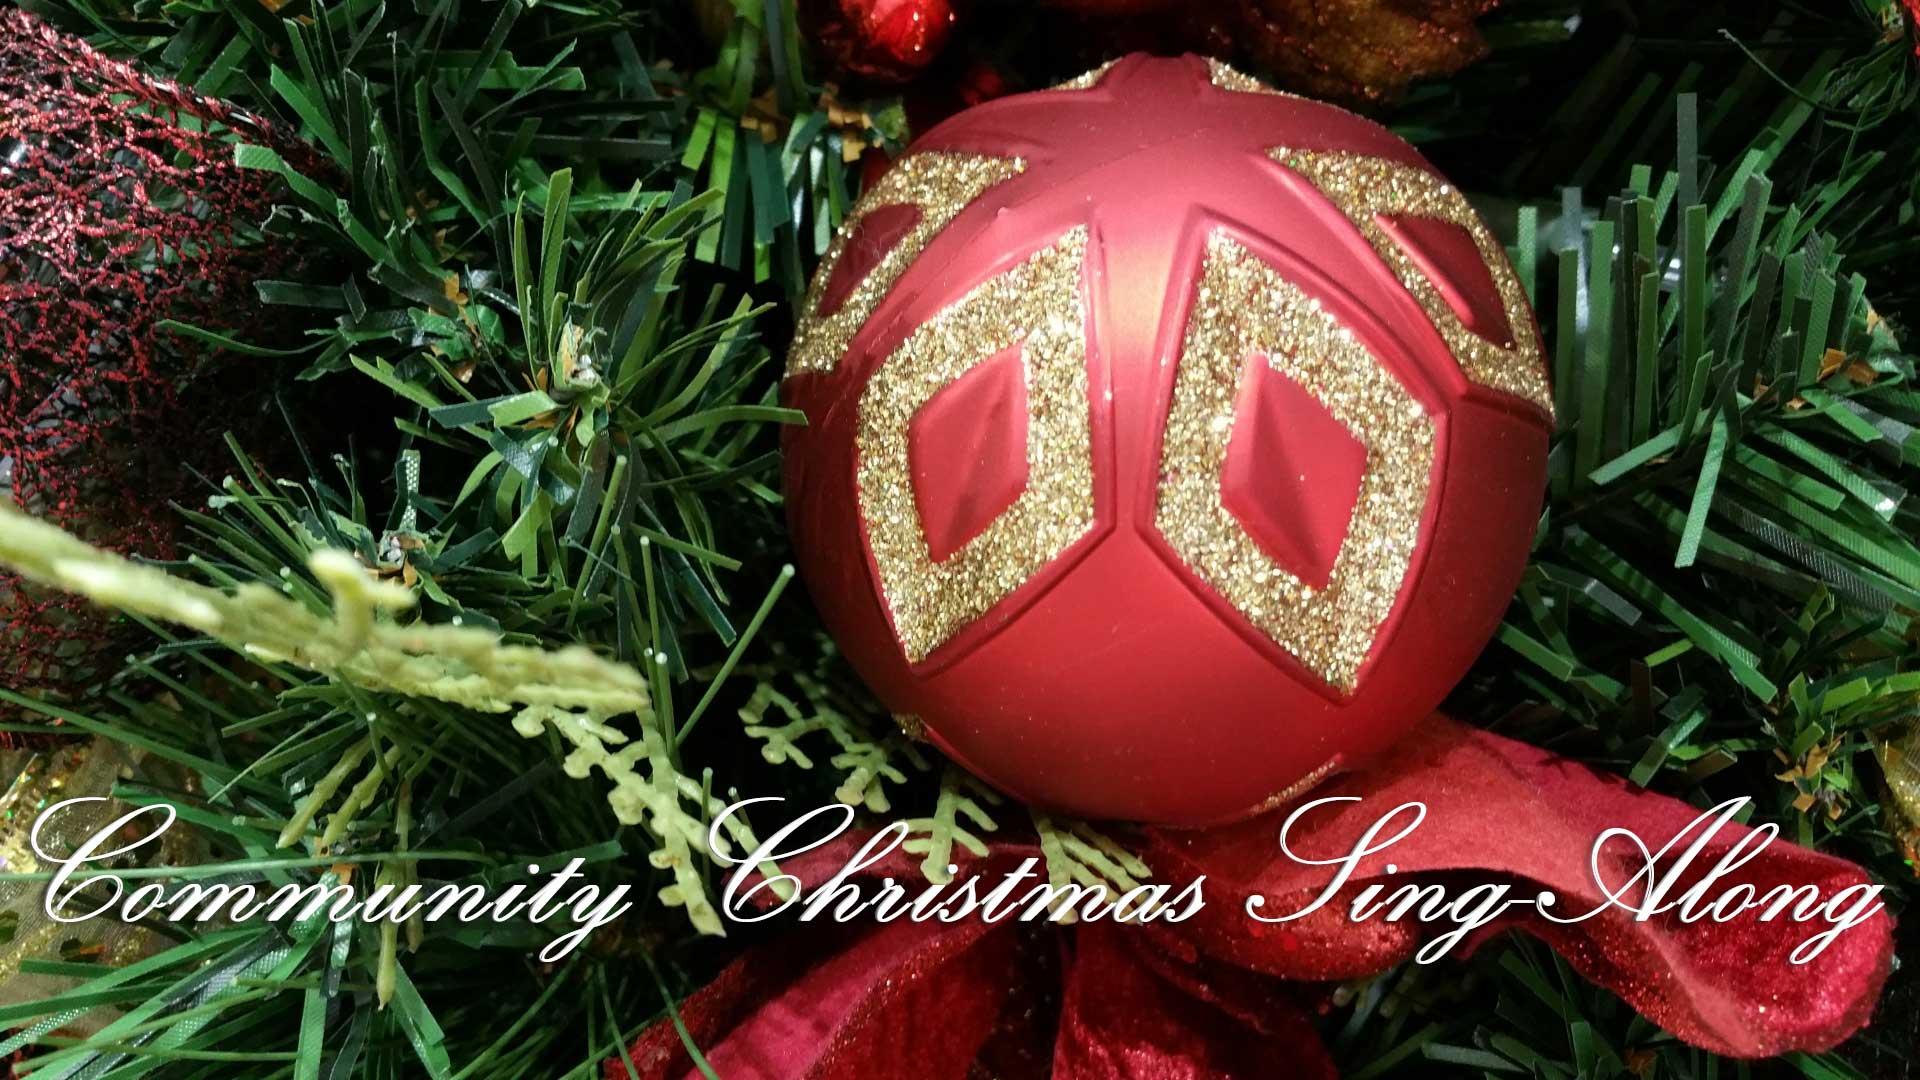 Community Christmas Sing-Along